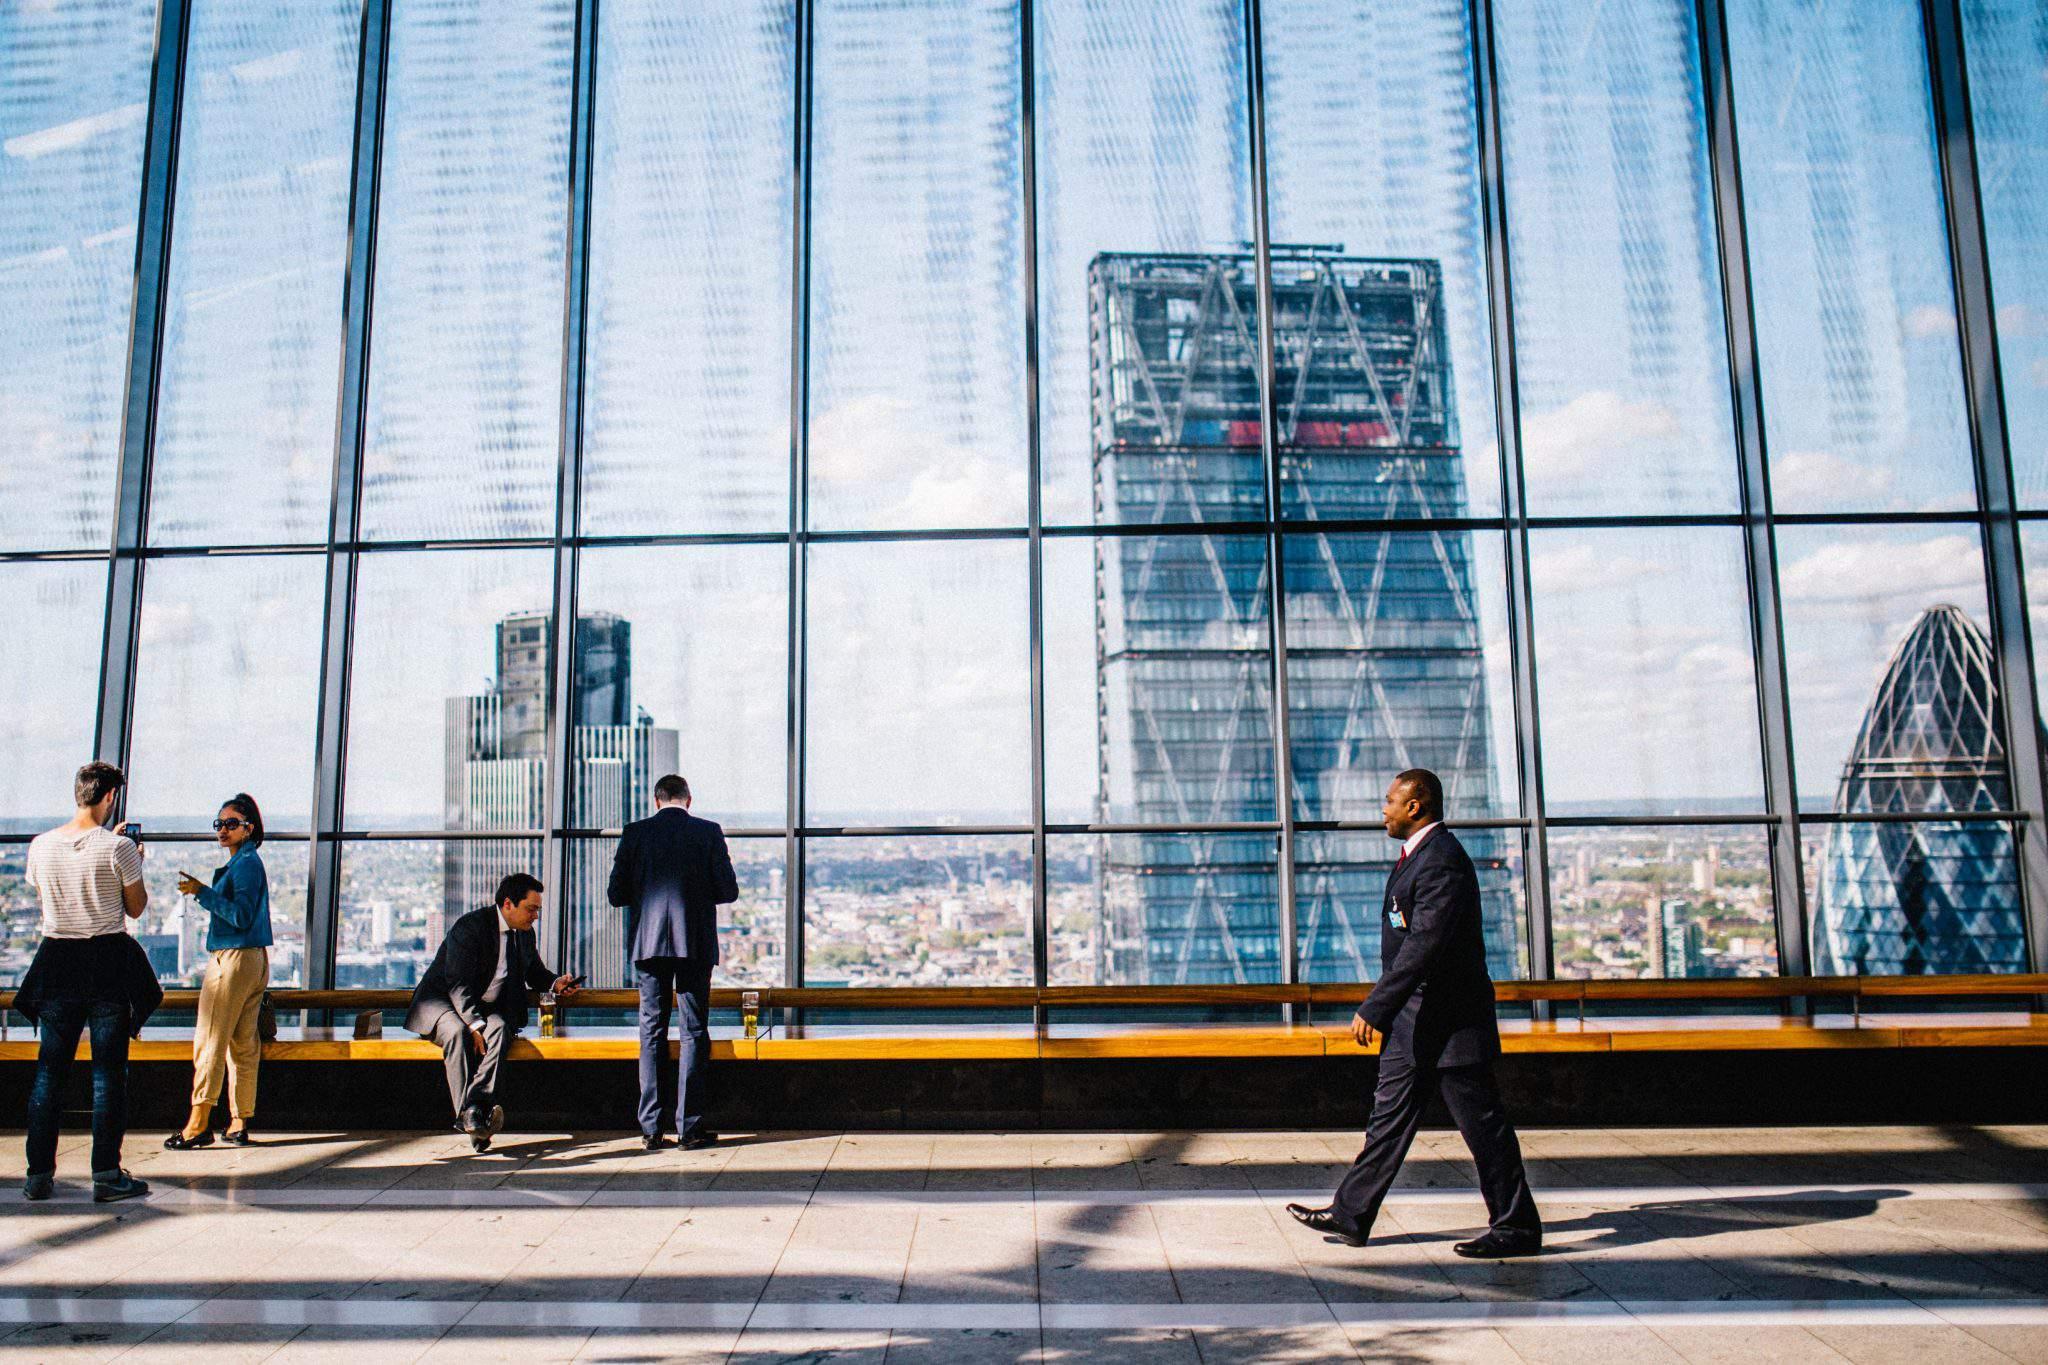 business finance economy